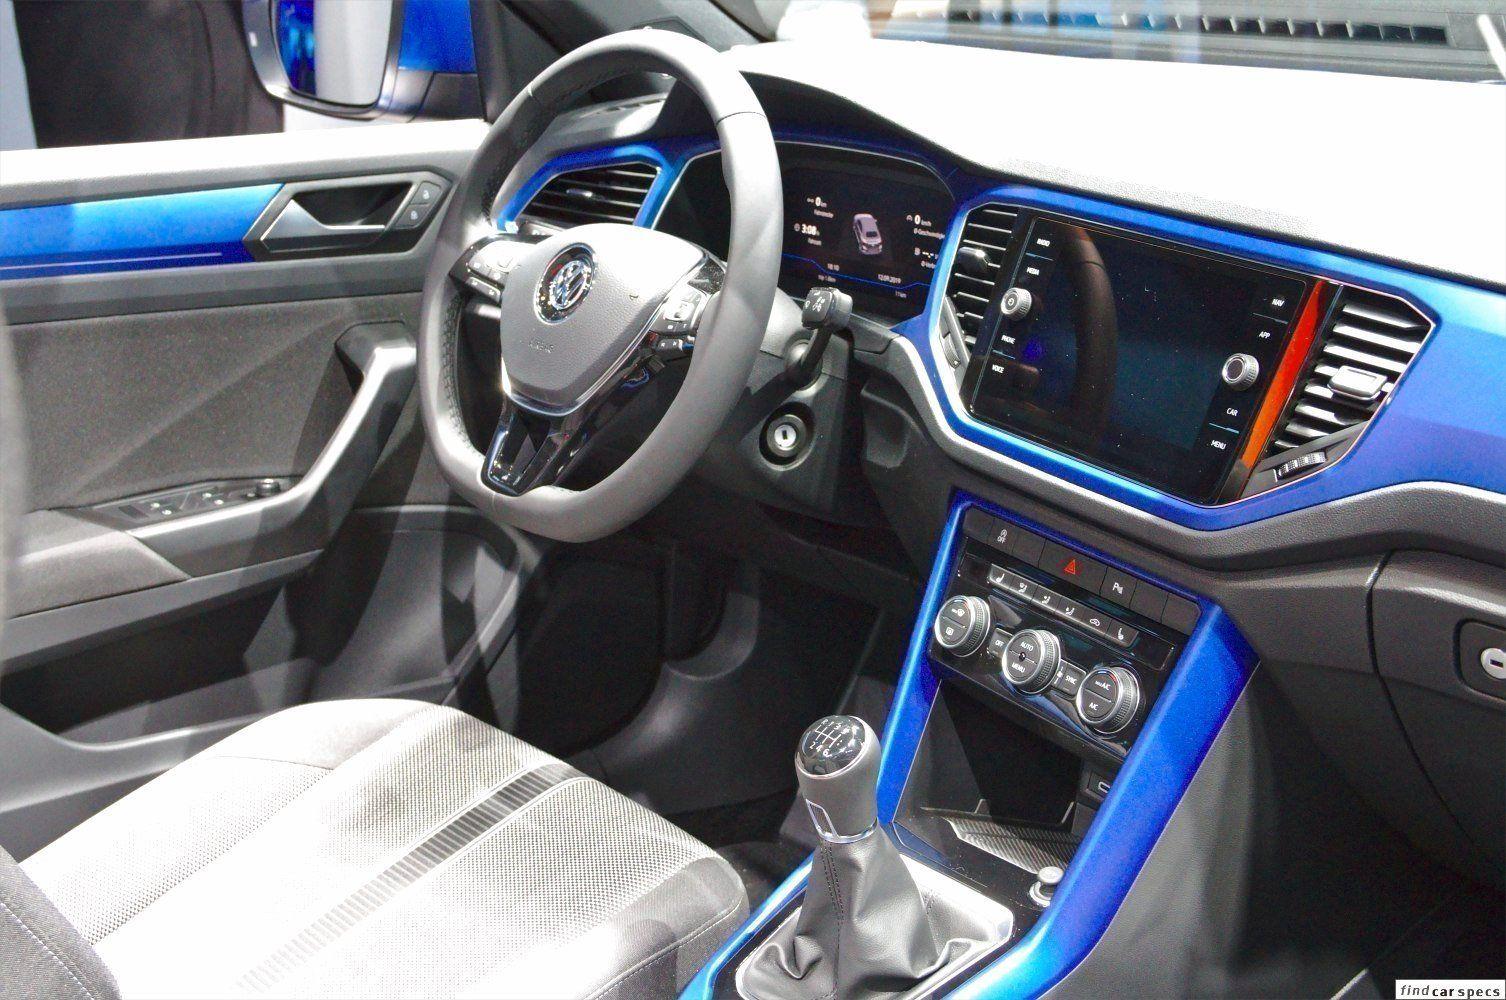 Volkswagen Troc T Roc Cabriolet 1 5 Tsi 150 Hp Act Opf Dsg Petrol Gasoline 2020 T Roc Cabriolet 1 5 Volkswagen Models Volkswagen Cabriolets